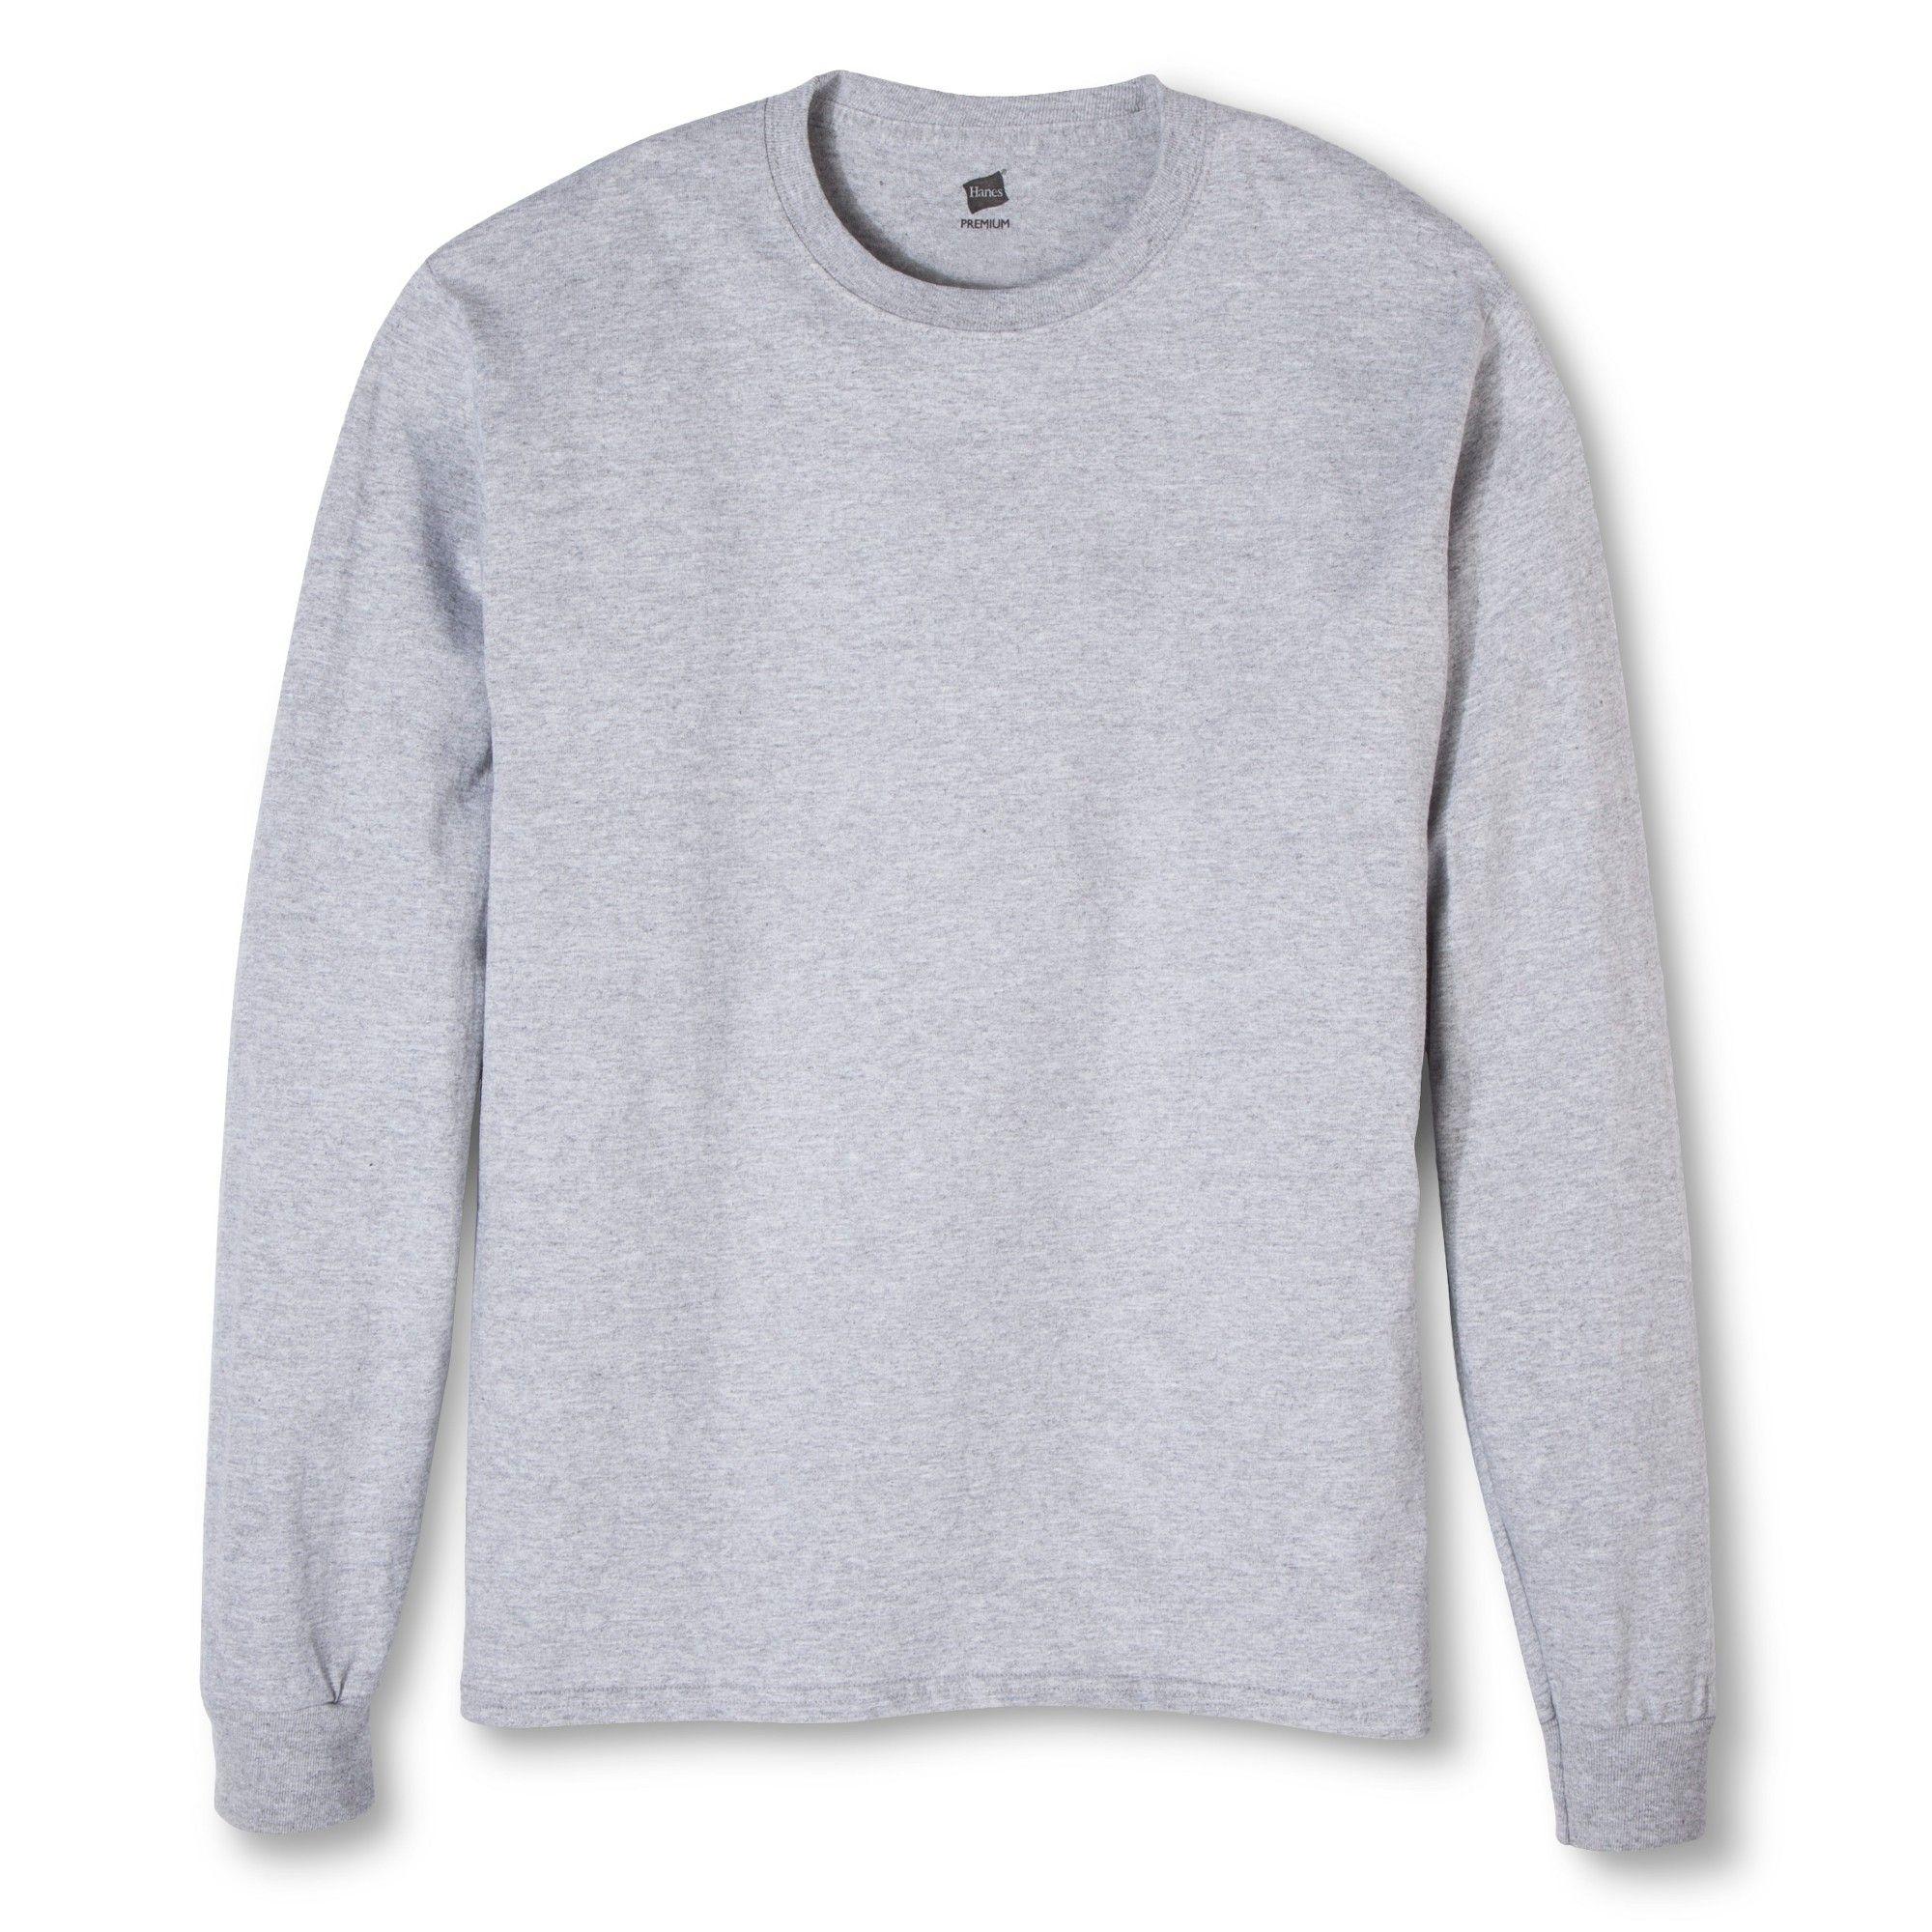 0b00db30f0 Hanes Men s Solid Long Sleeve T-Shirts Silver L